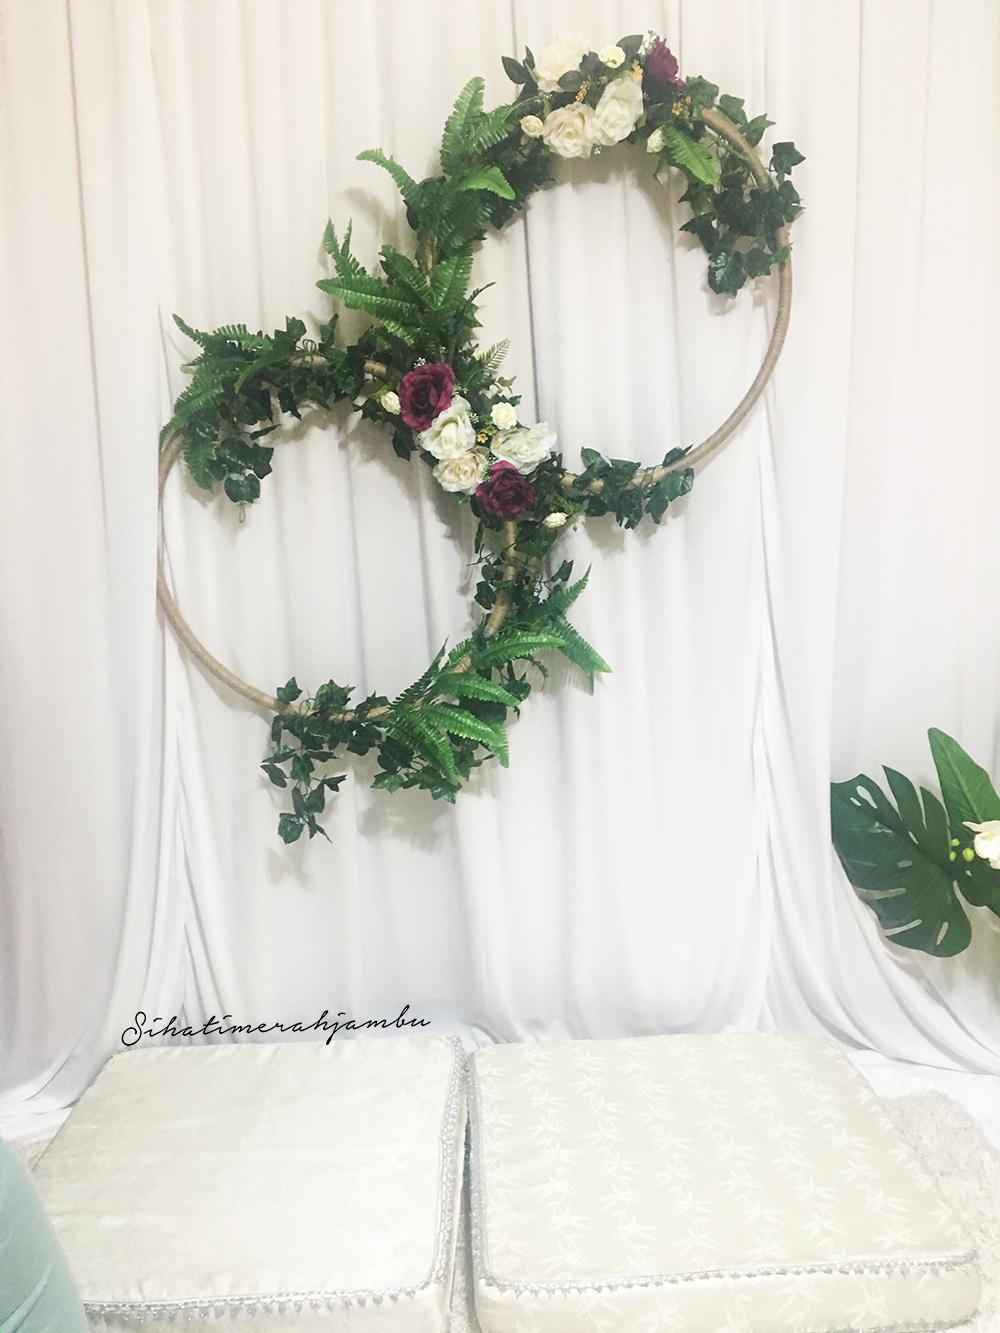 Blog Sihatimerahjambu Wedding